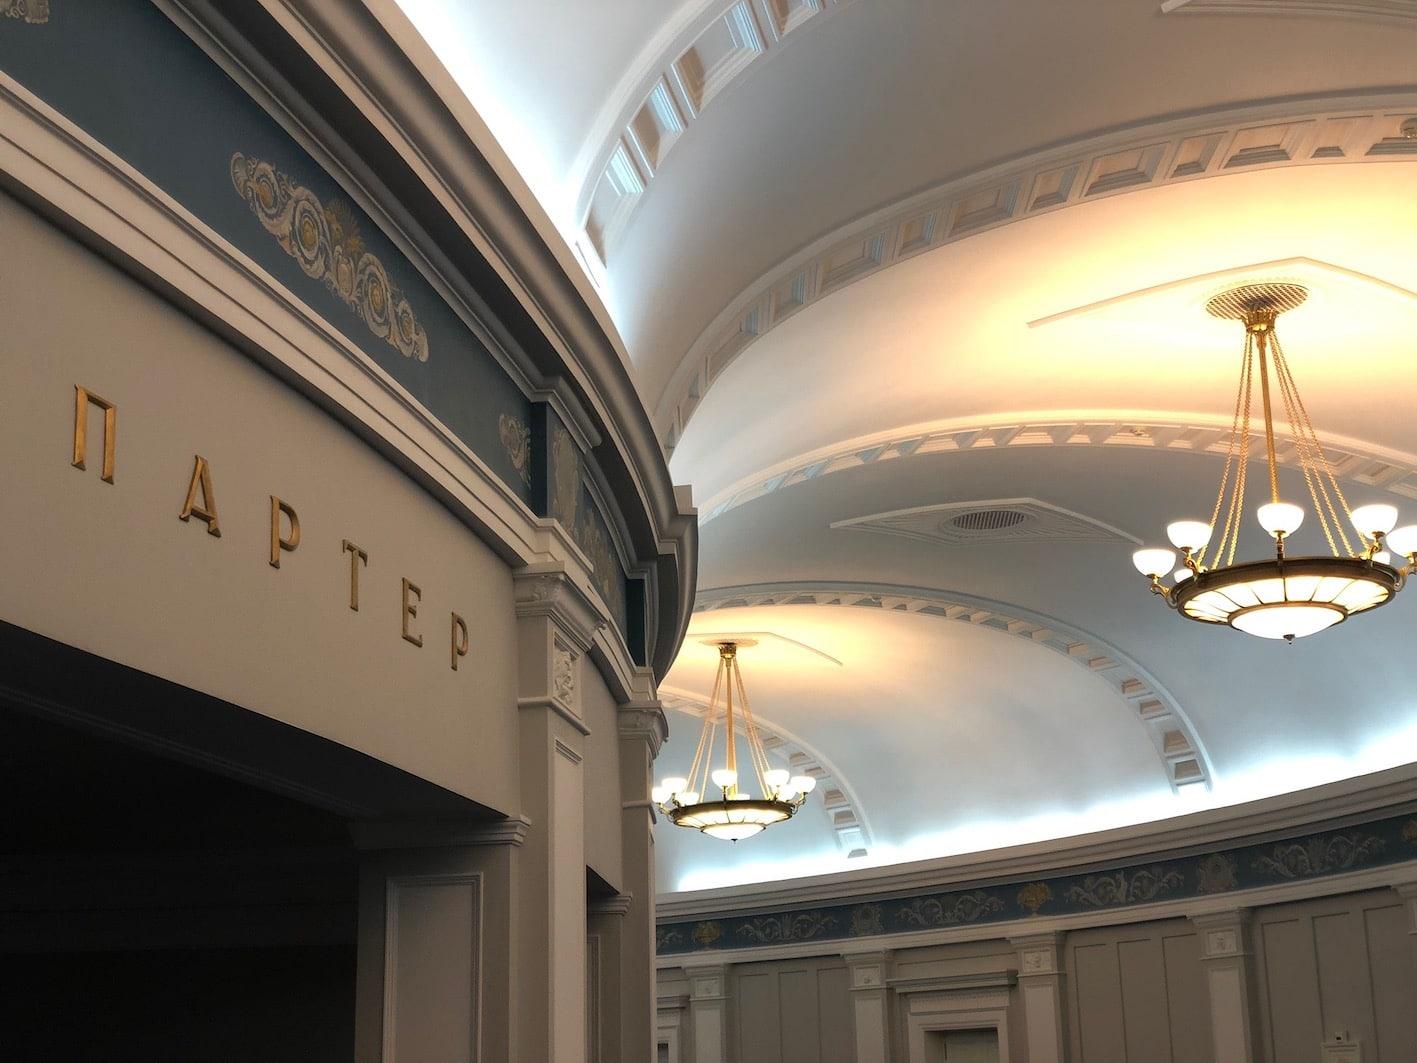 I operahuset